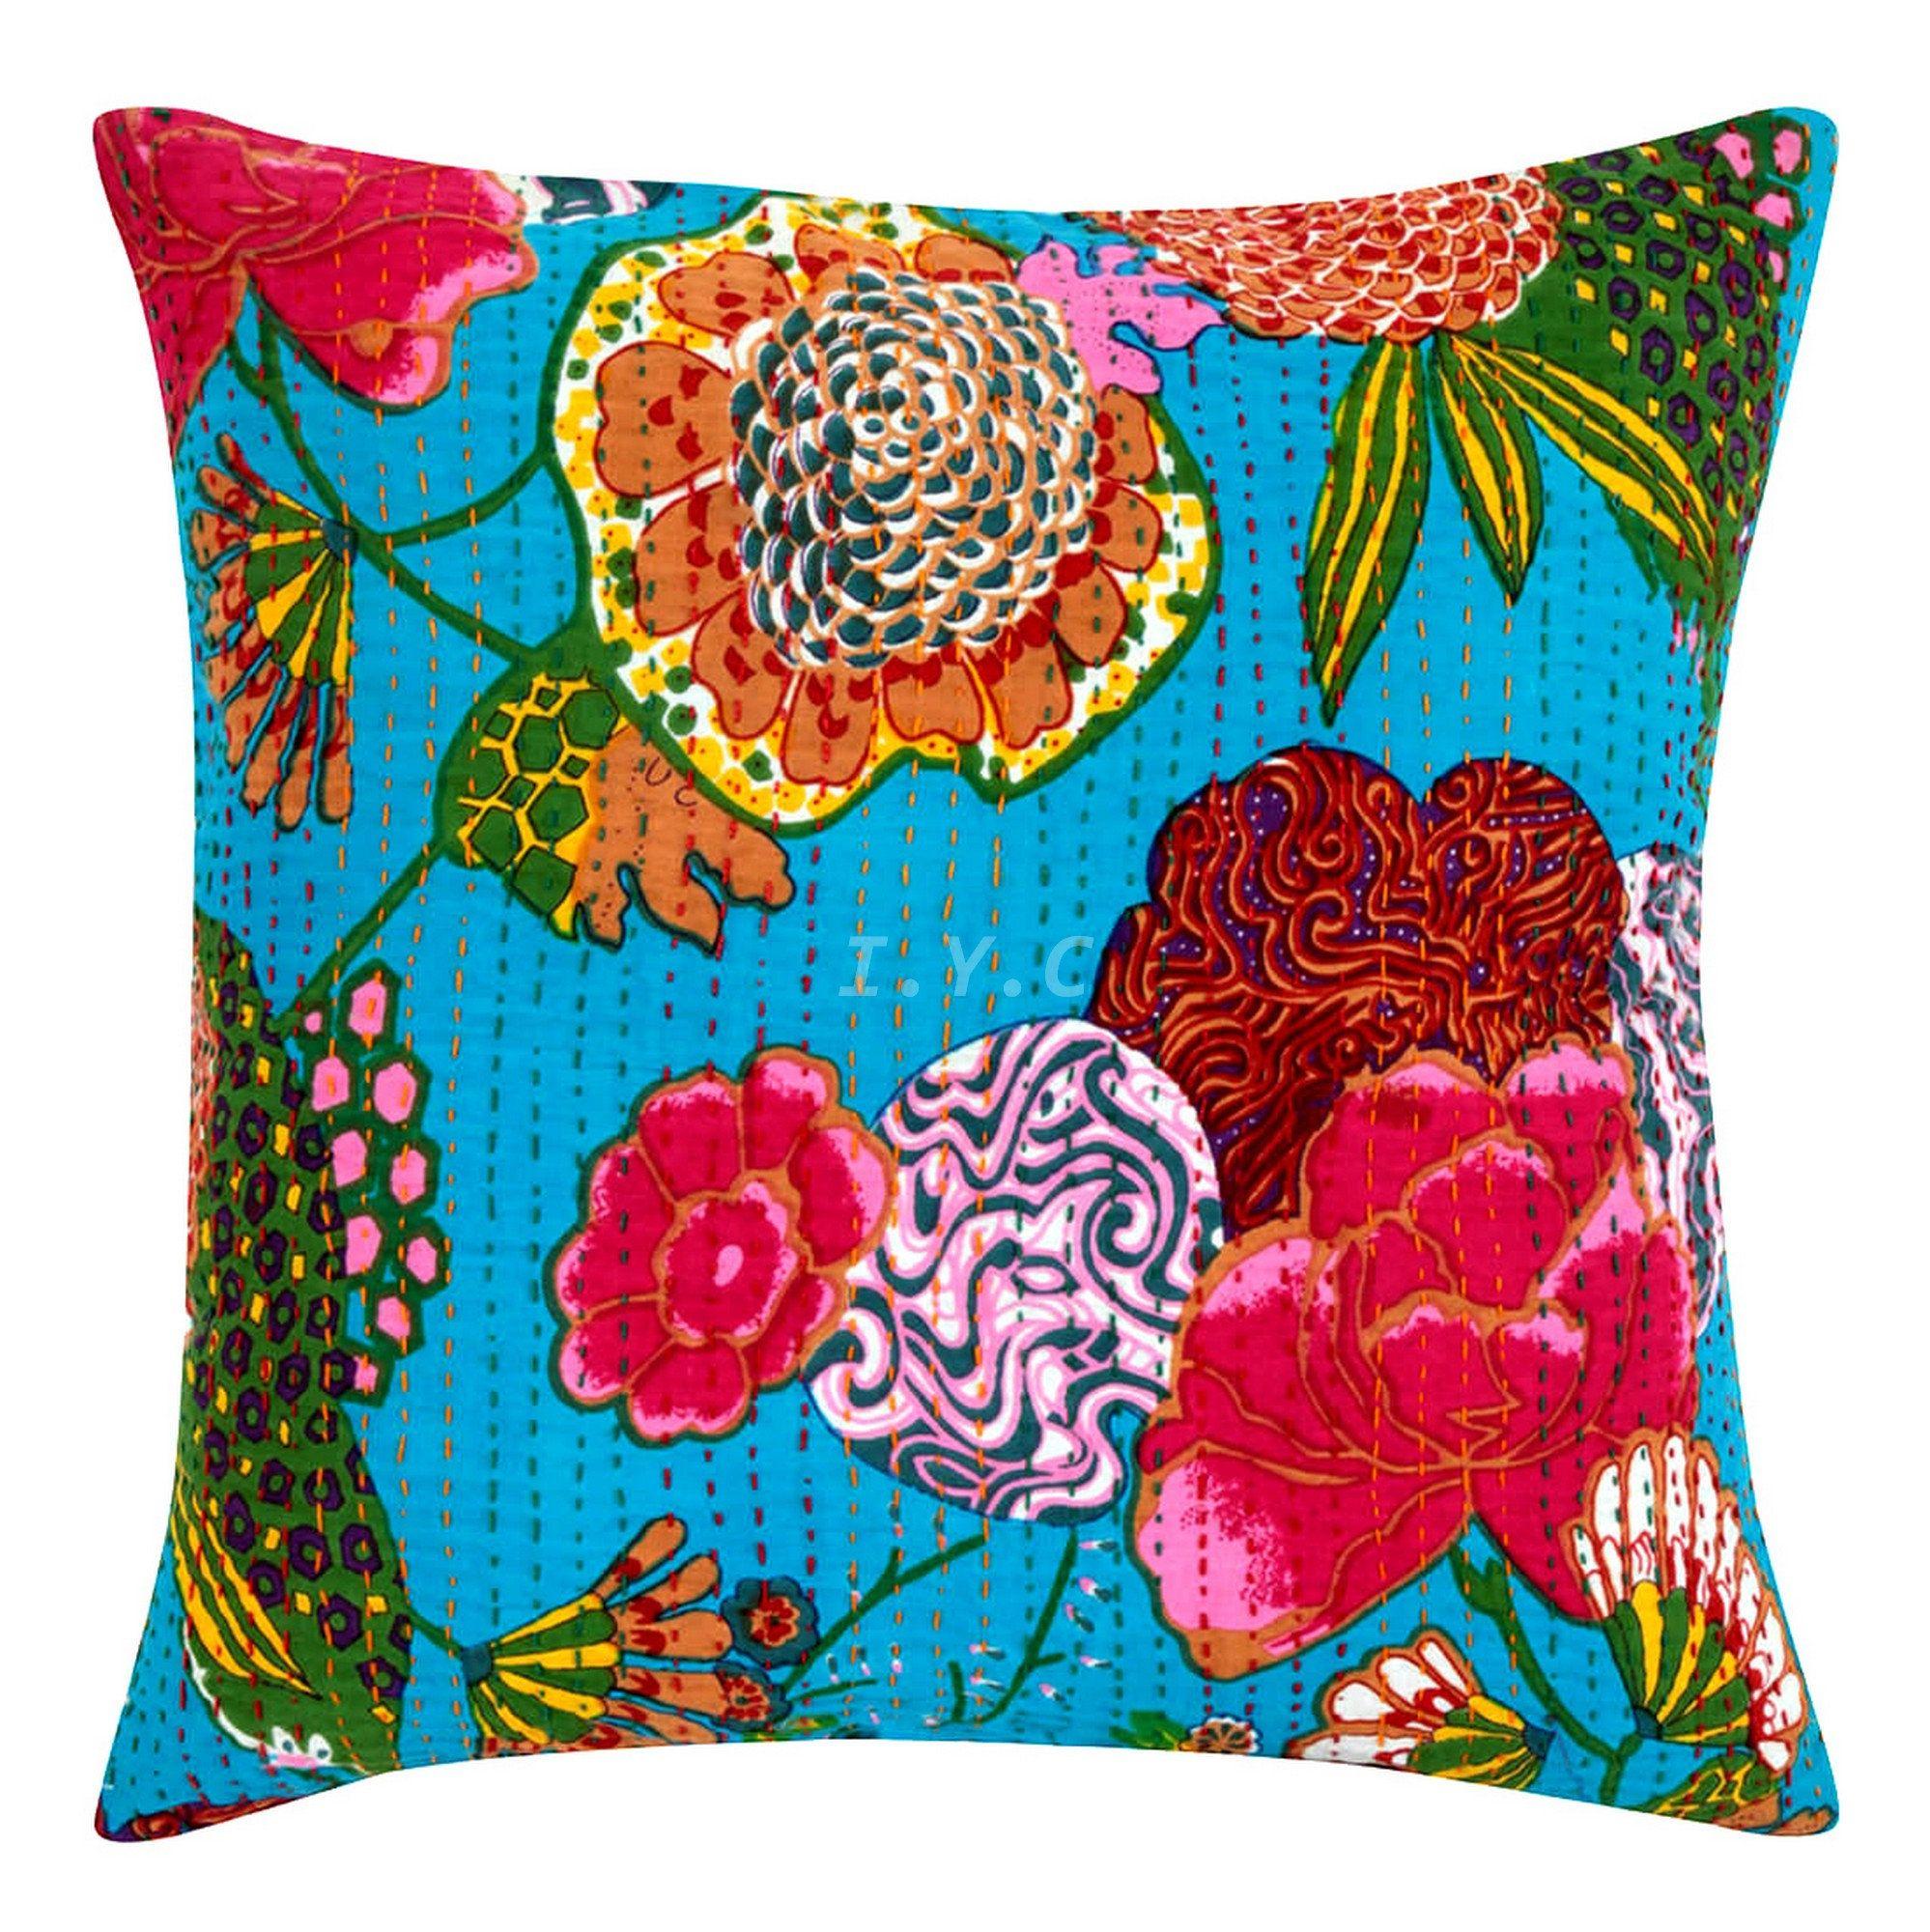 Indian kantha work pillow cover,Decorative Pillow,Throw Indian Pillow Cover ,Sofa Pillow ,Couch Pillow, 16x16 inch Pillow # ilu0003